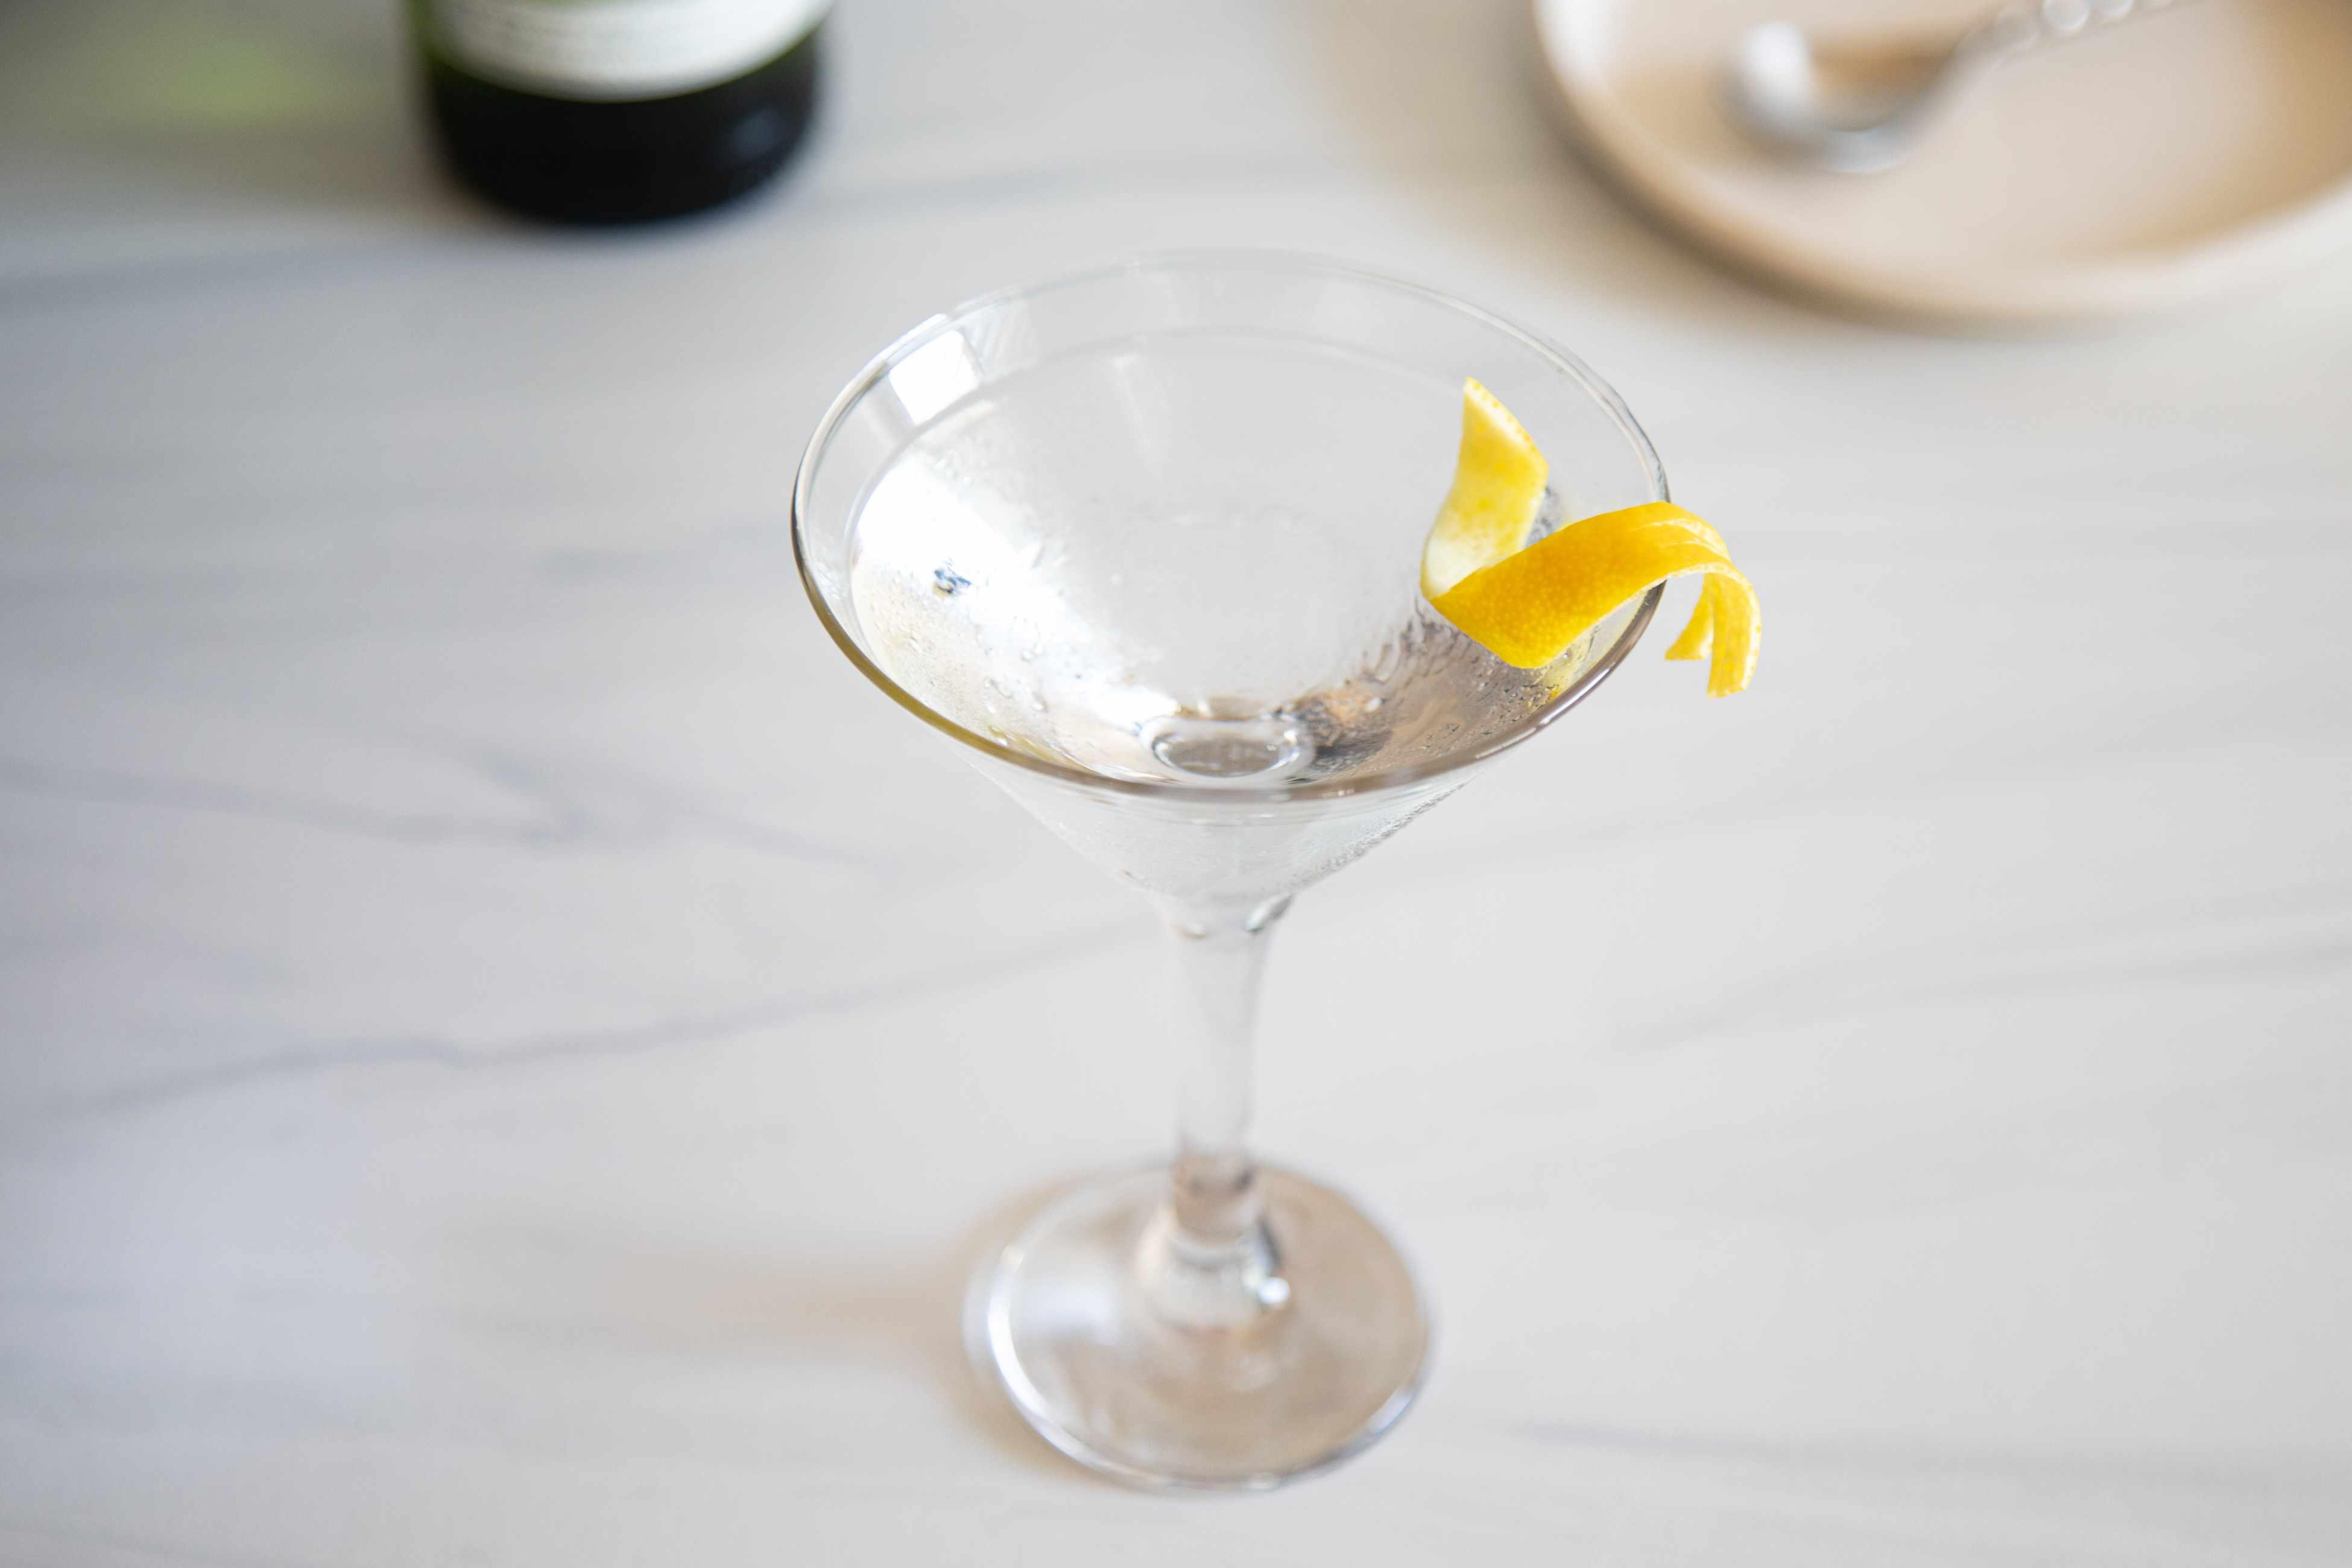 50/50 Gin Martini with a lemon peel garnish.